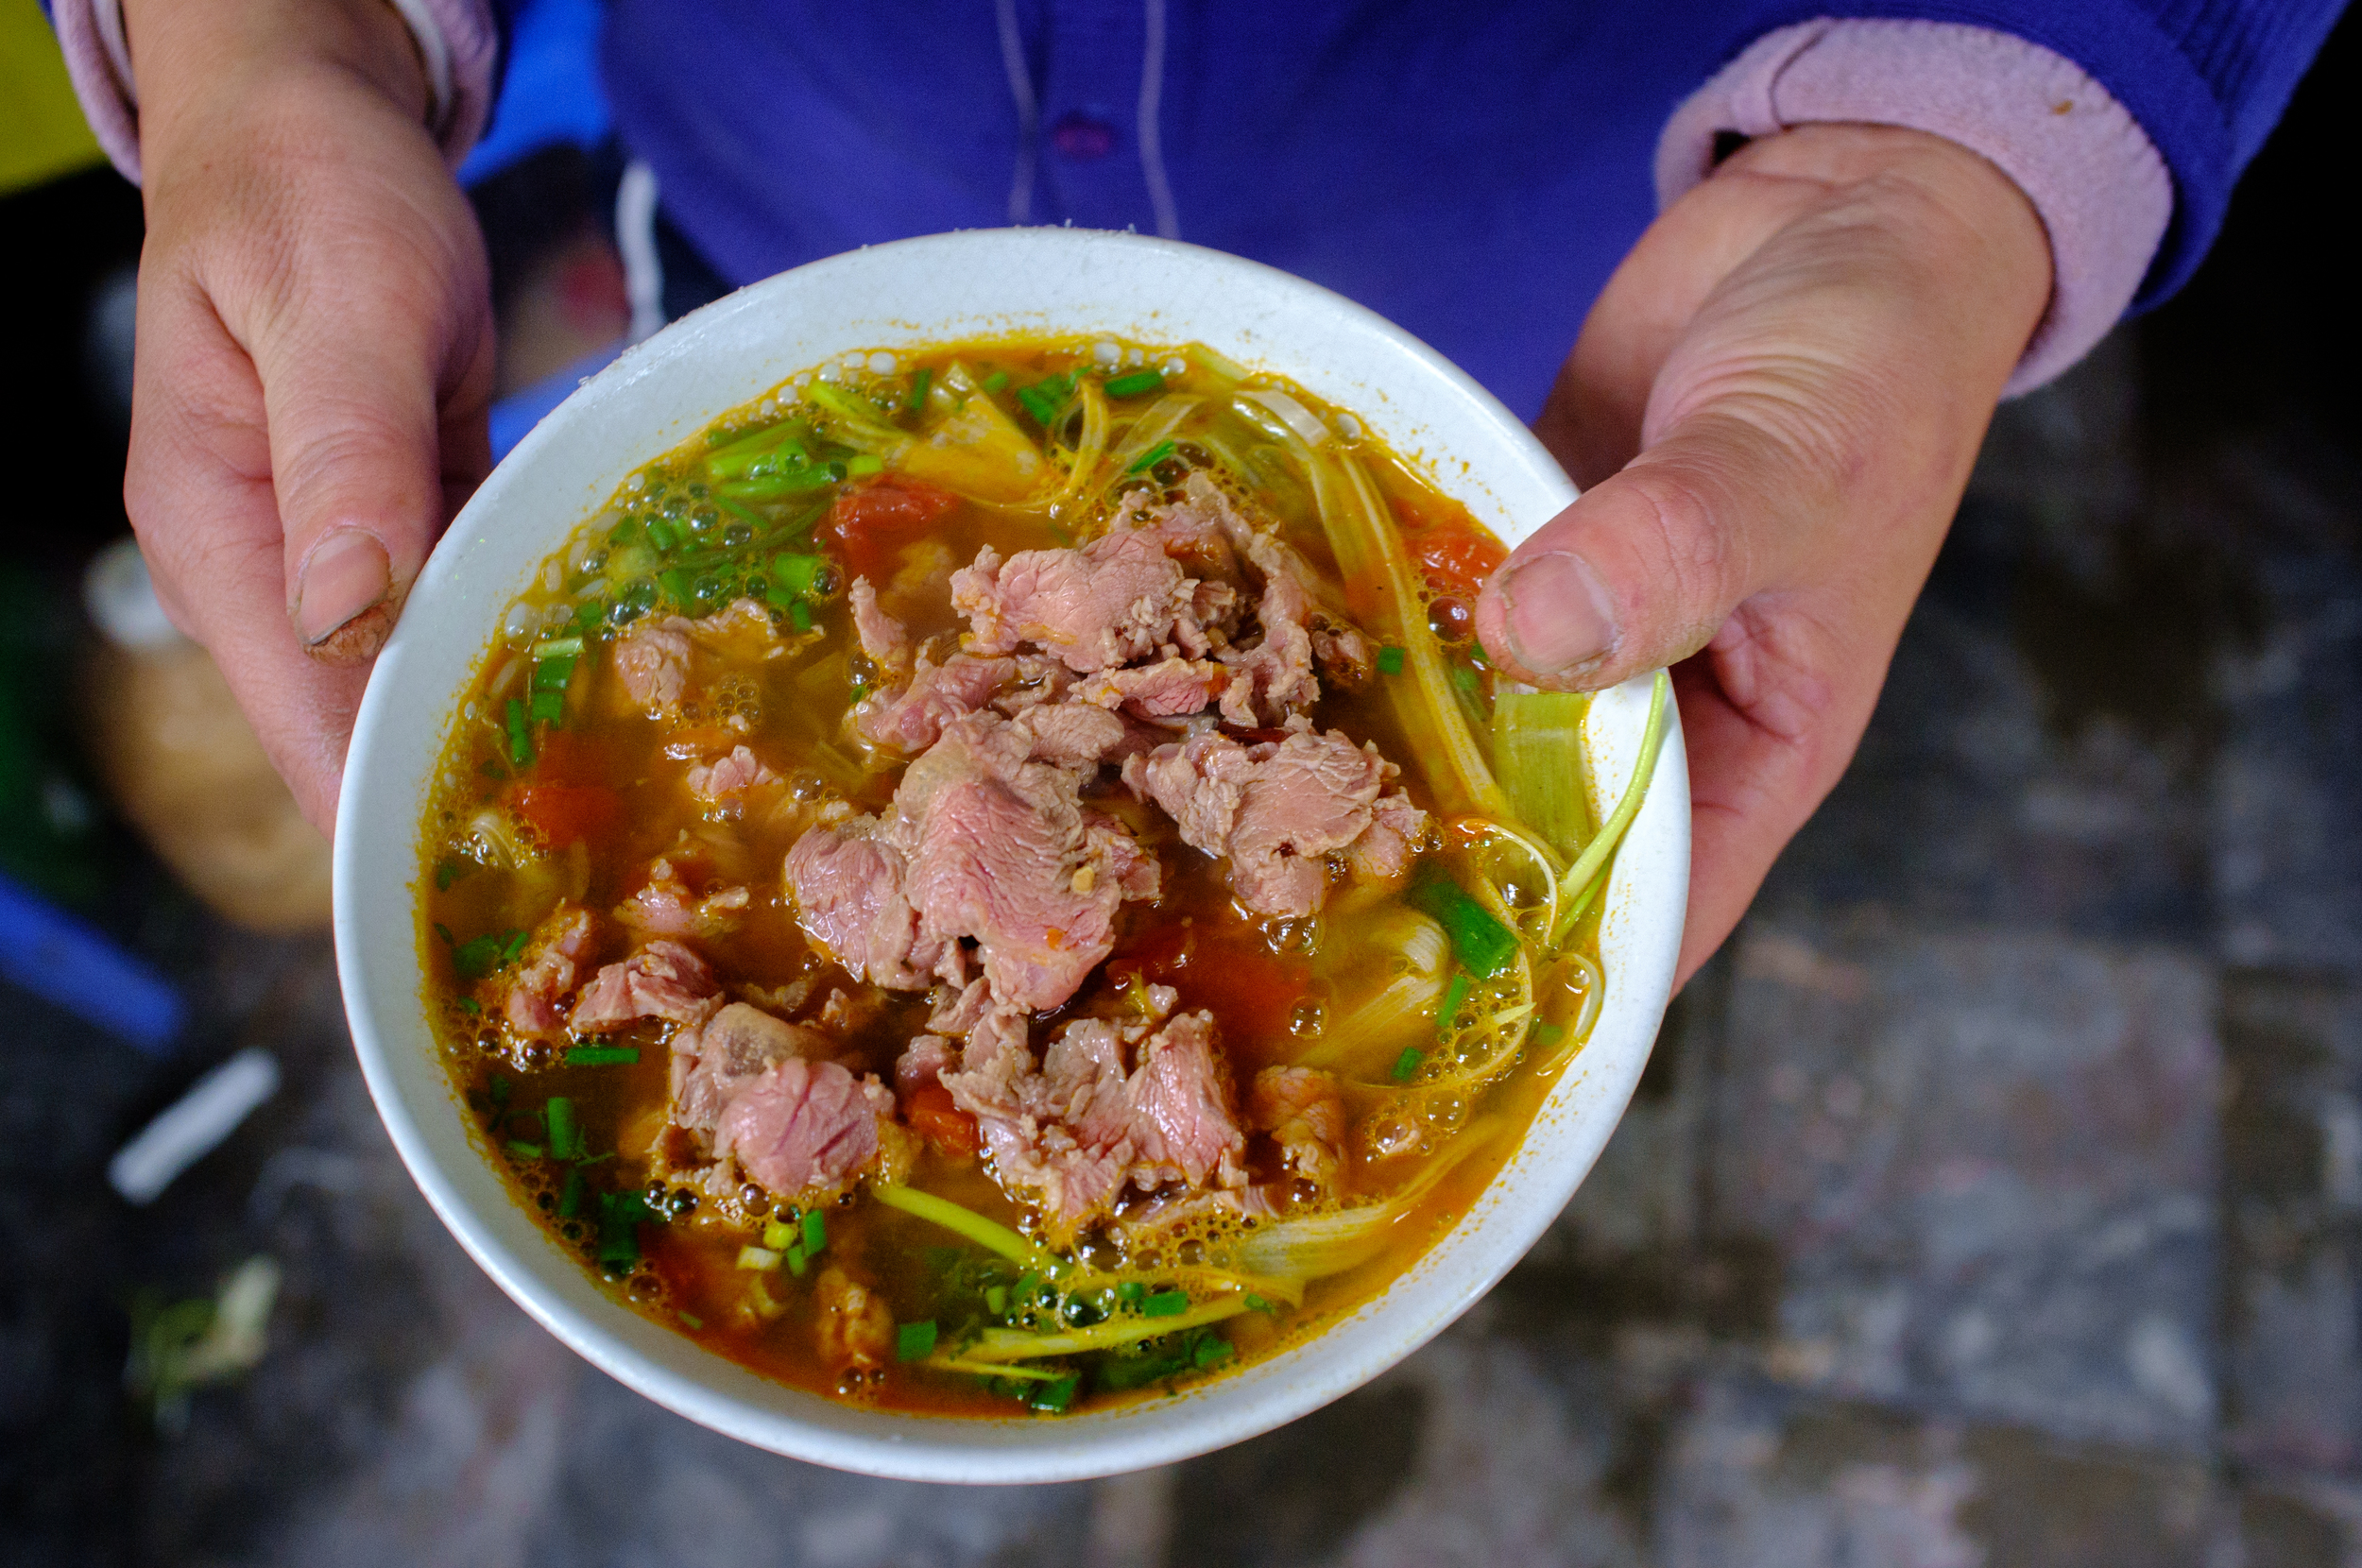 A beautiful bowl of  bún riêu cua bò  for lunch